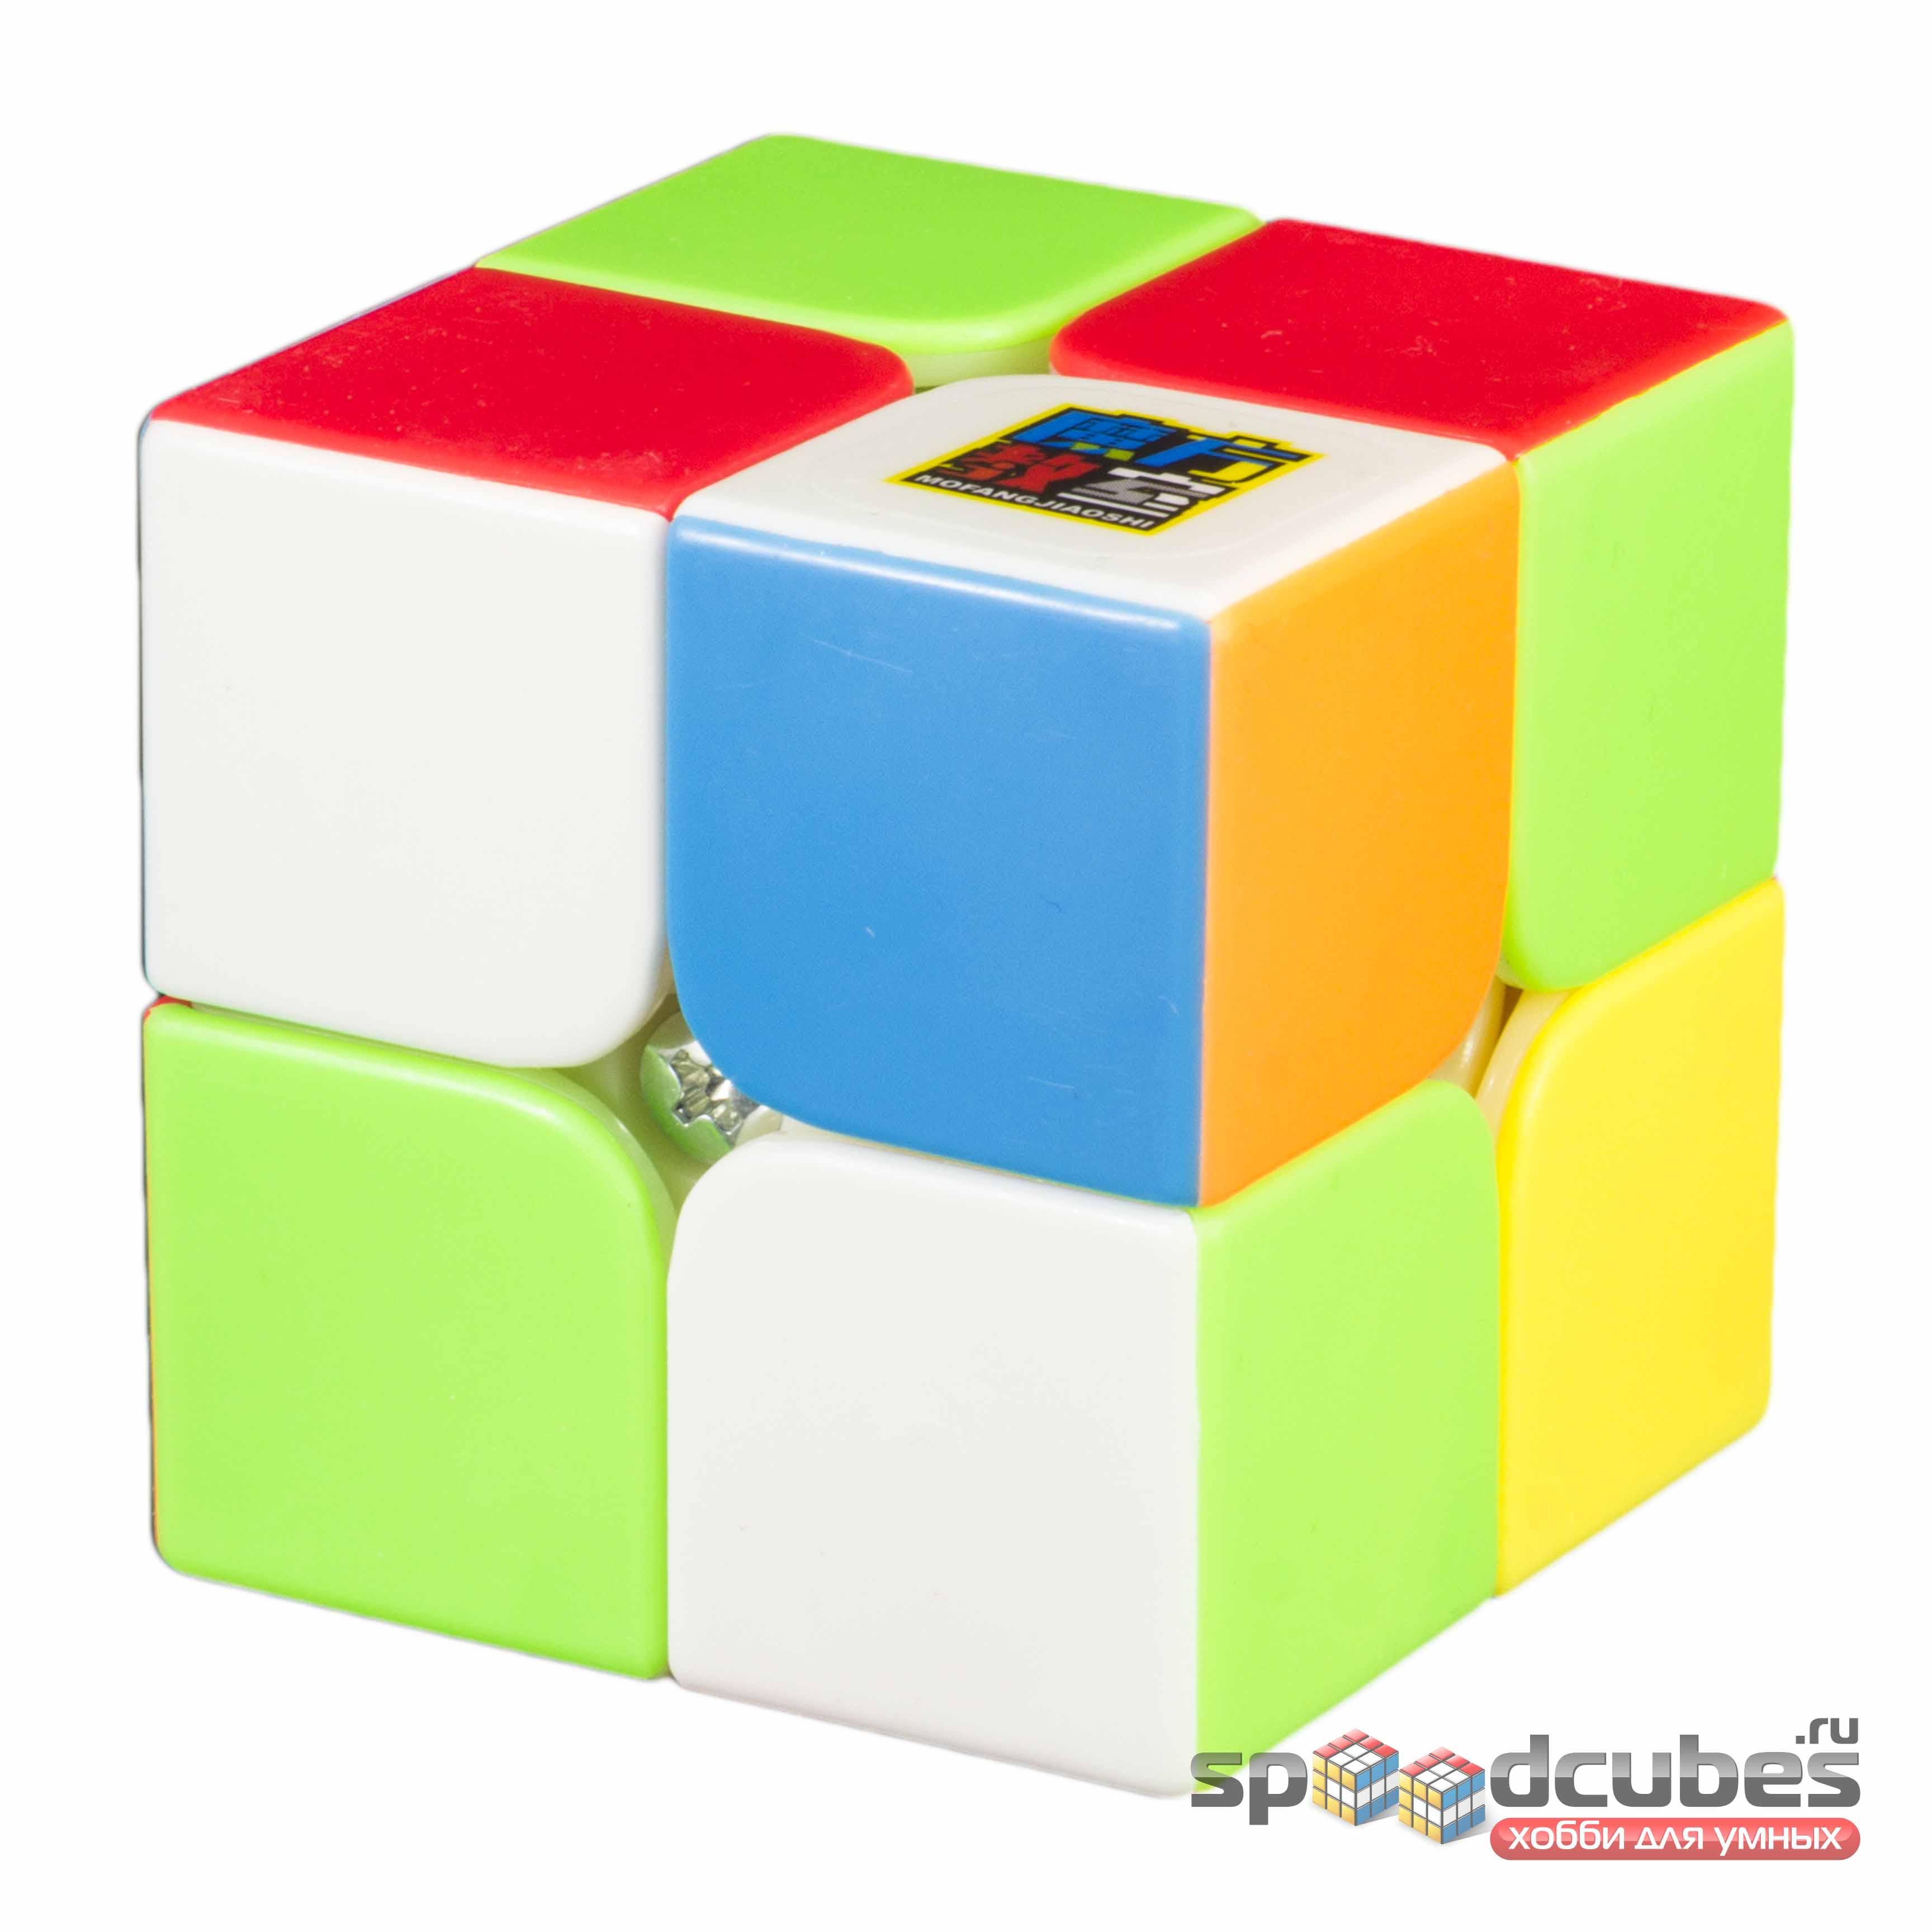 MoYu Cubing Classroom Mini (набор Moyu MF2s, MF3s, MF4s) 3